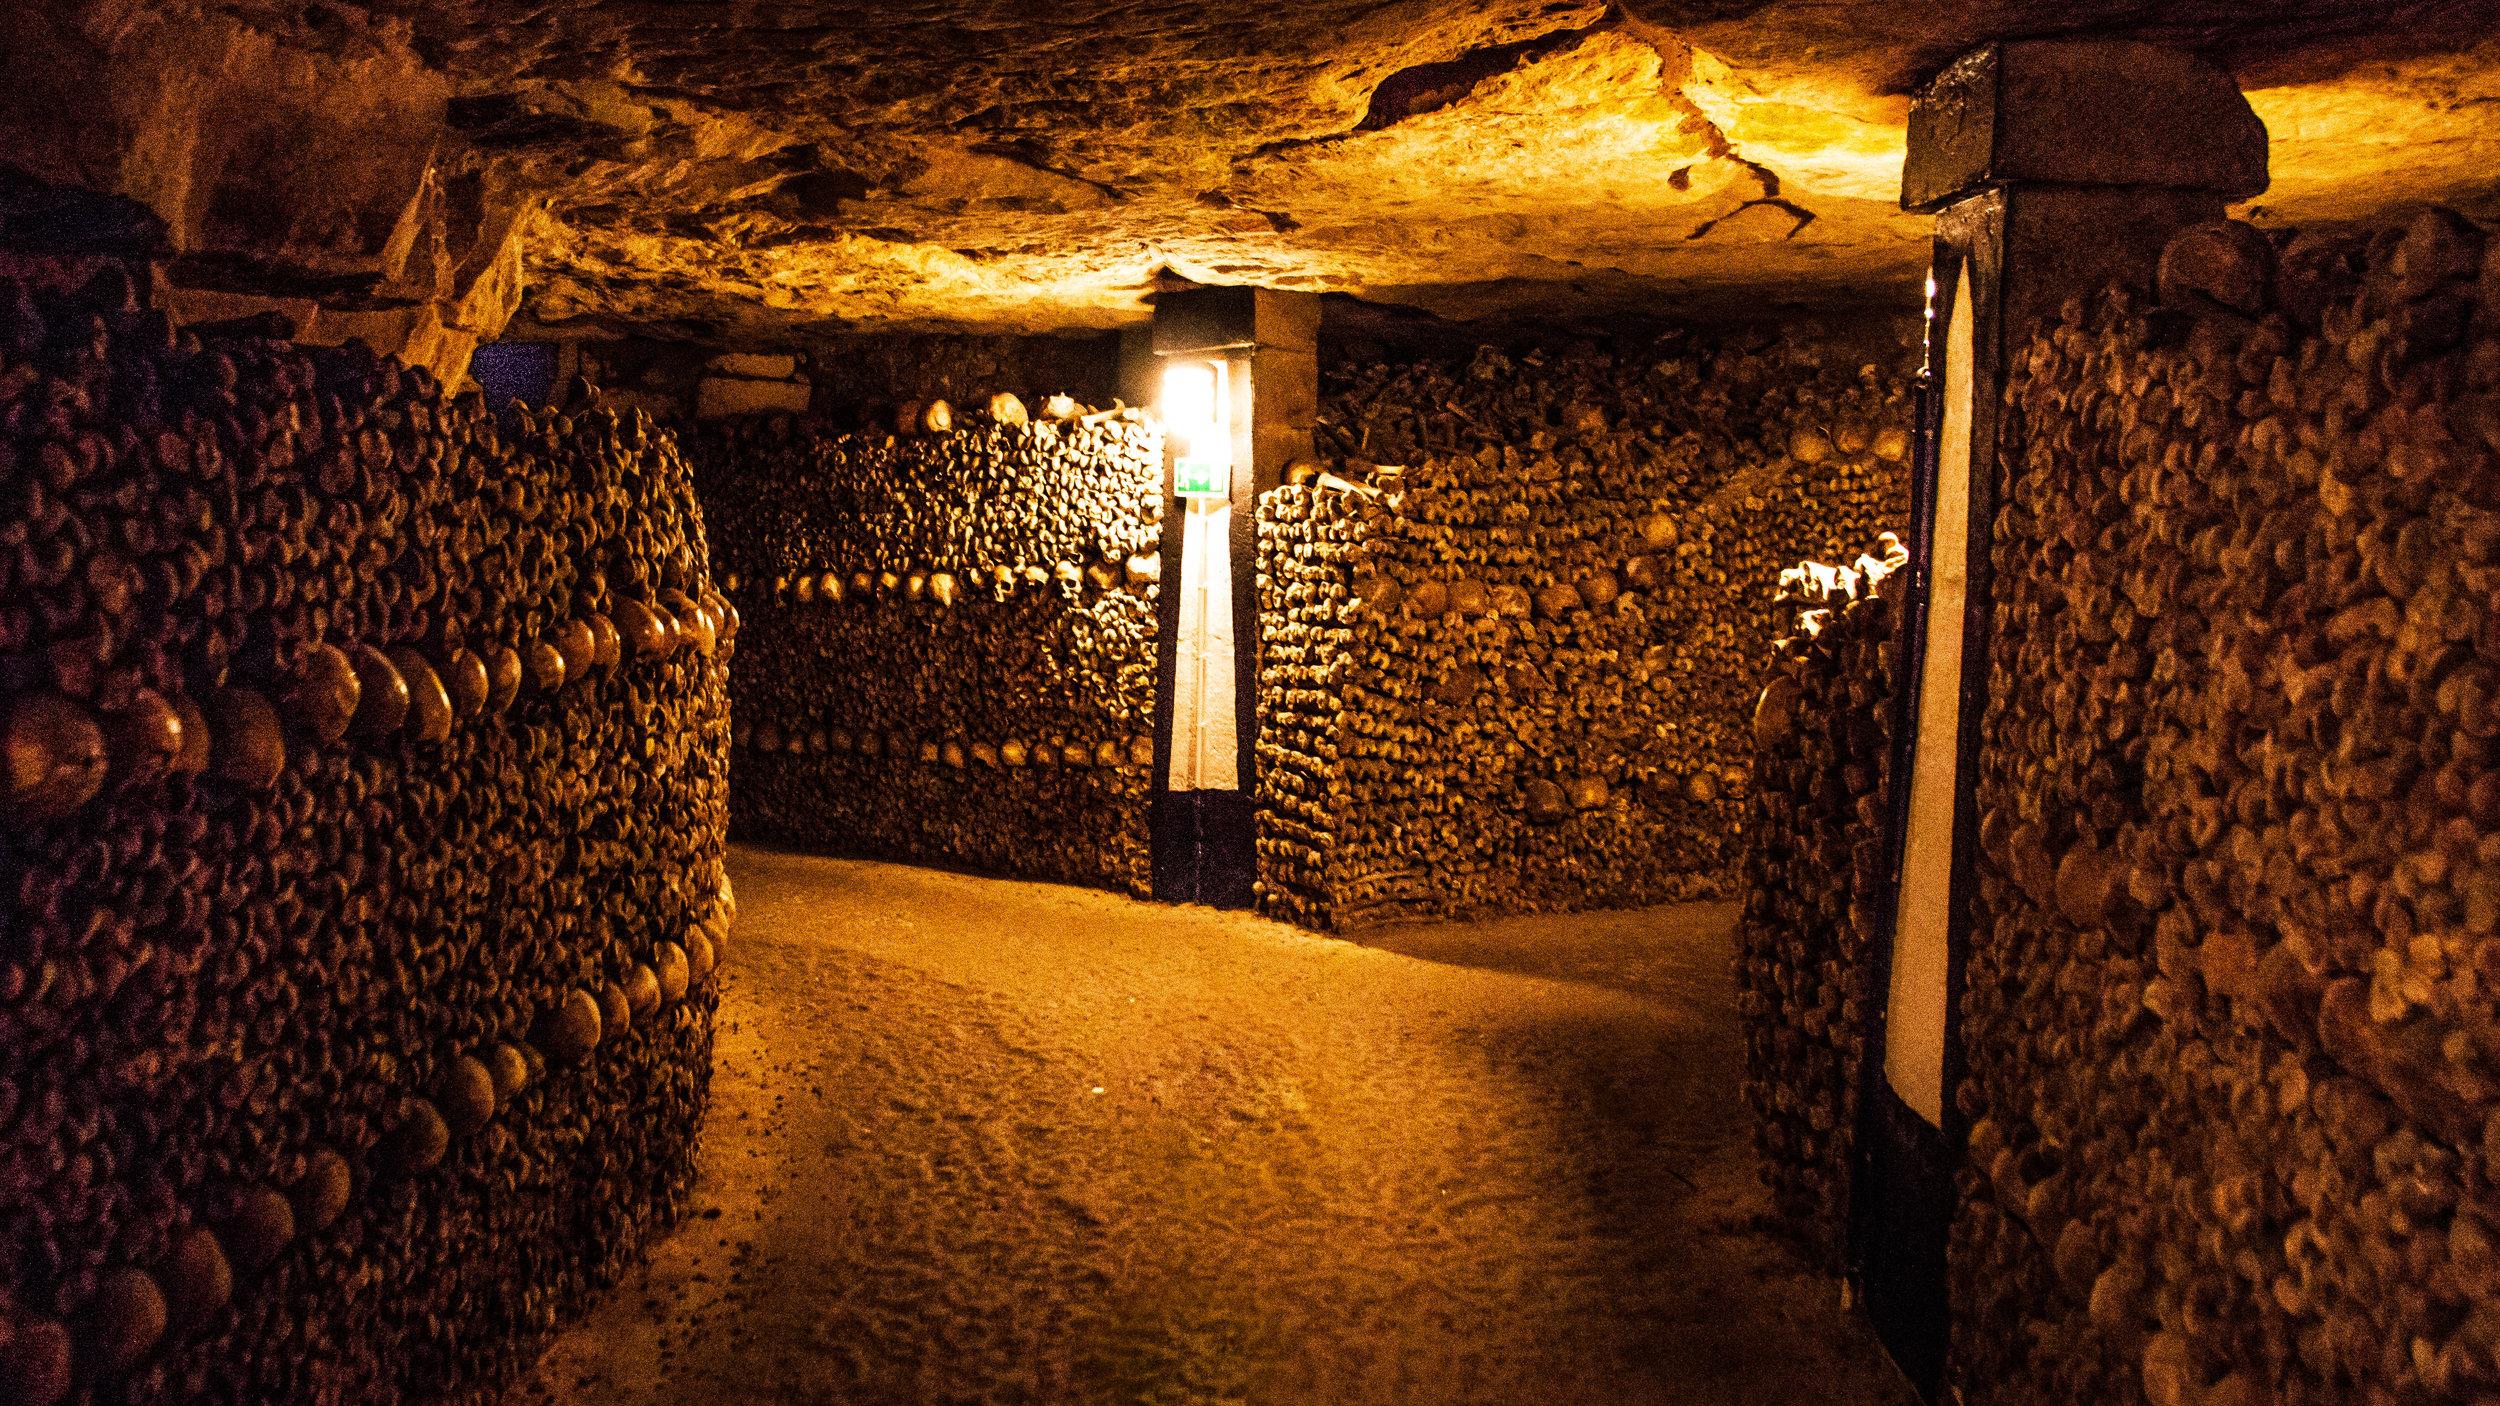 Catacomb adventures